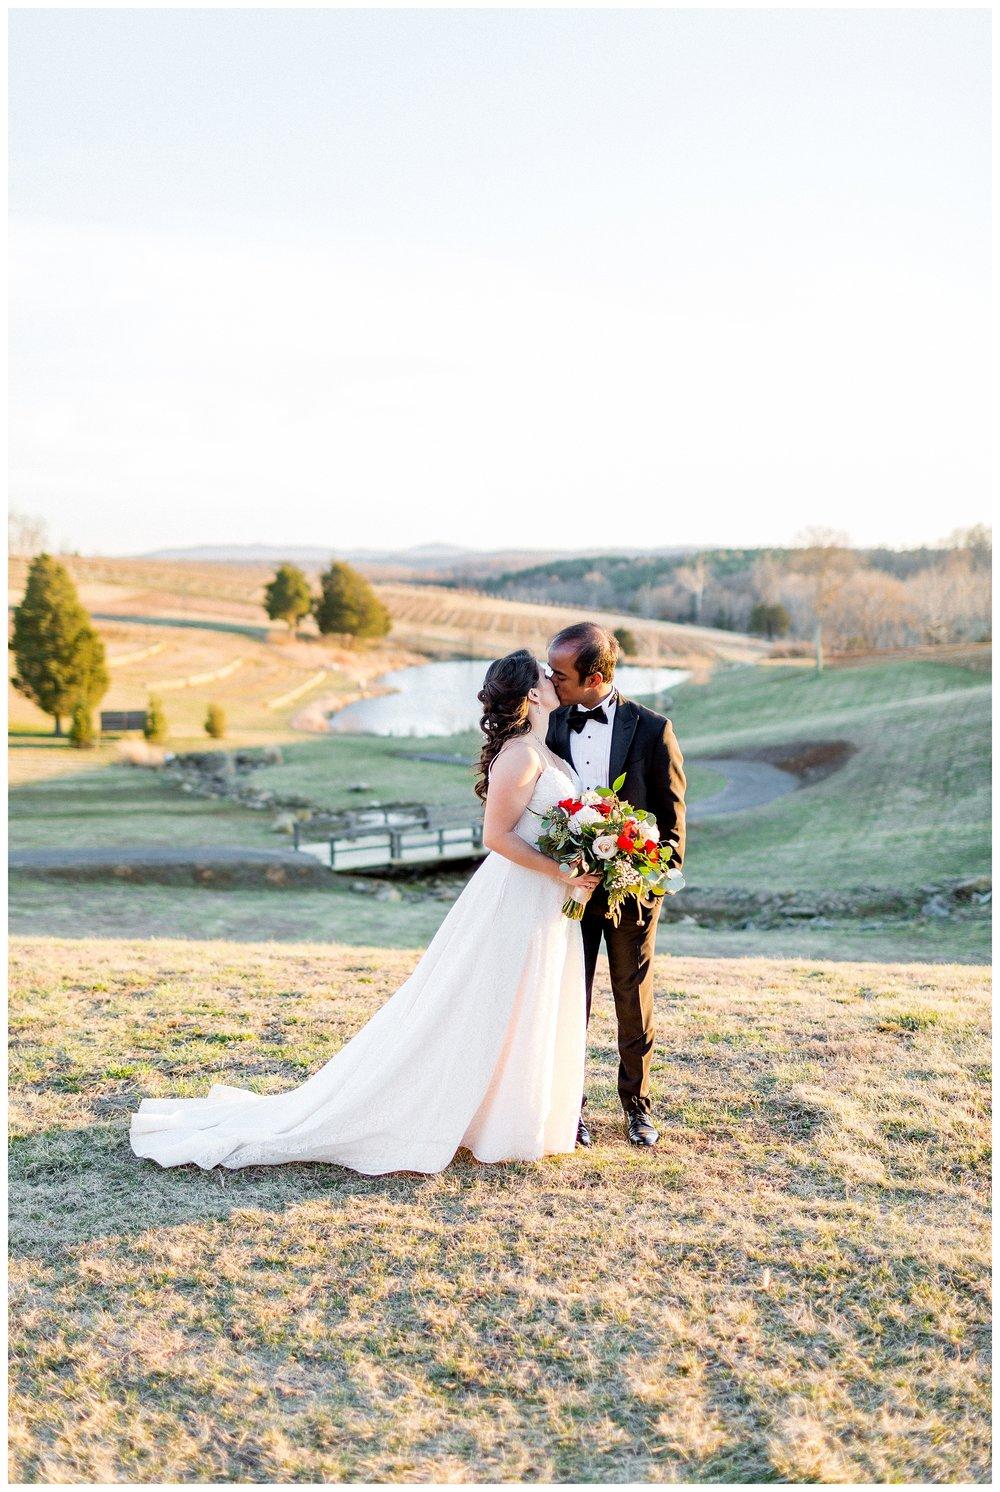 Stone Tower Winery Wedding | Virginia Winter Wedding | VA Wedding Photographer Kir Tuben_0000.jpg